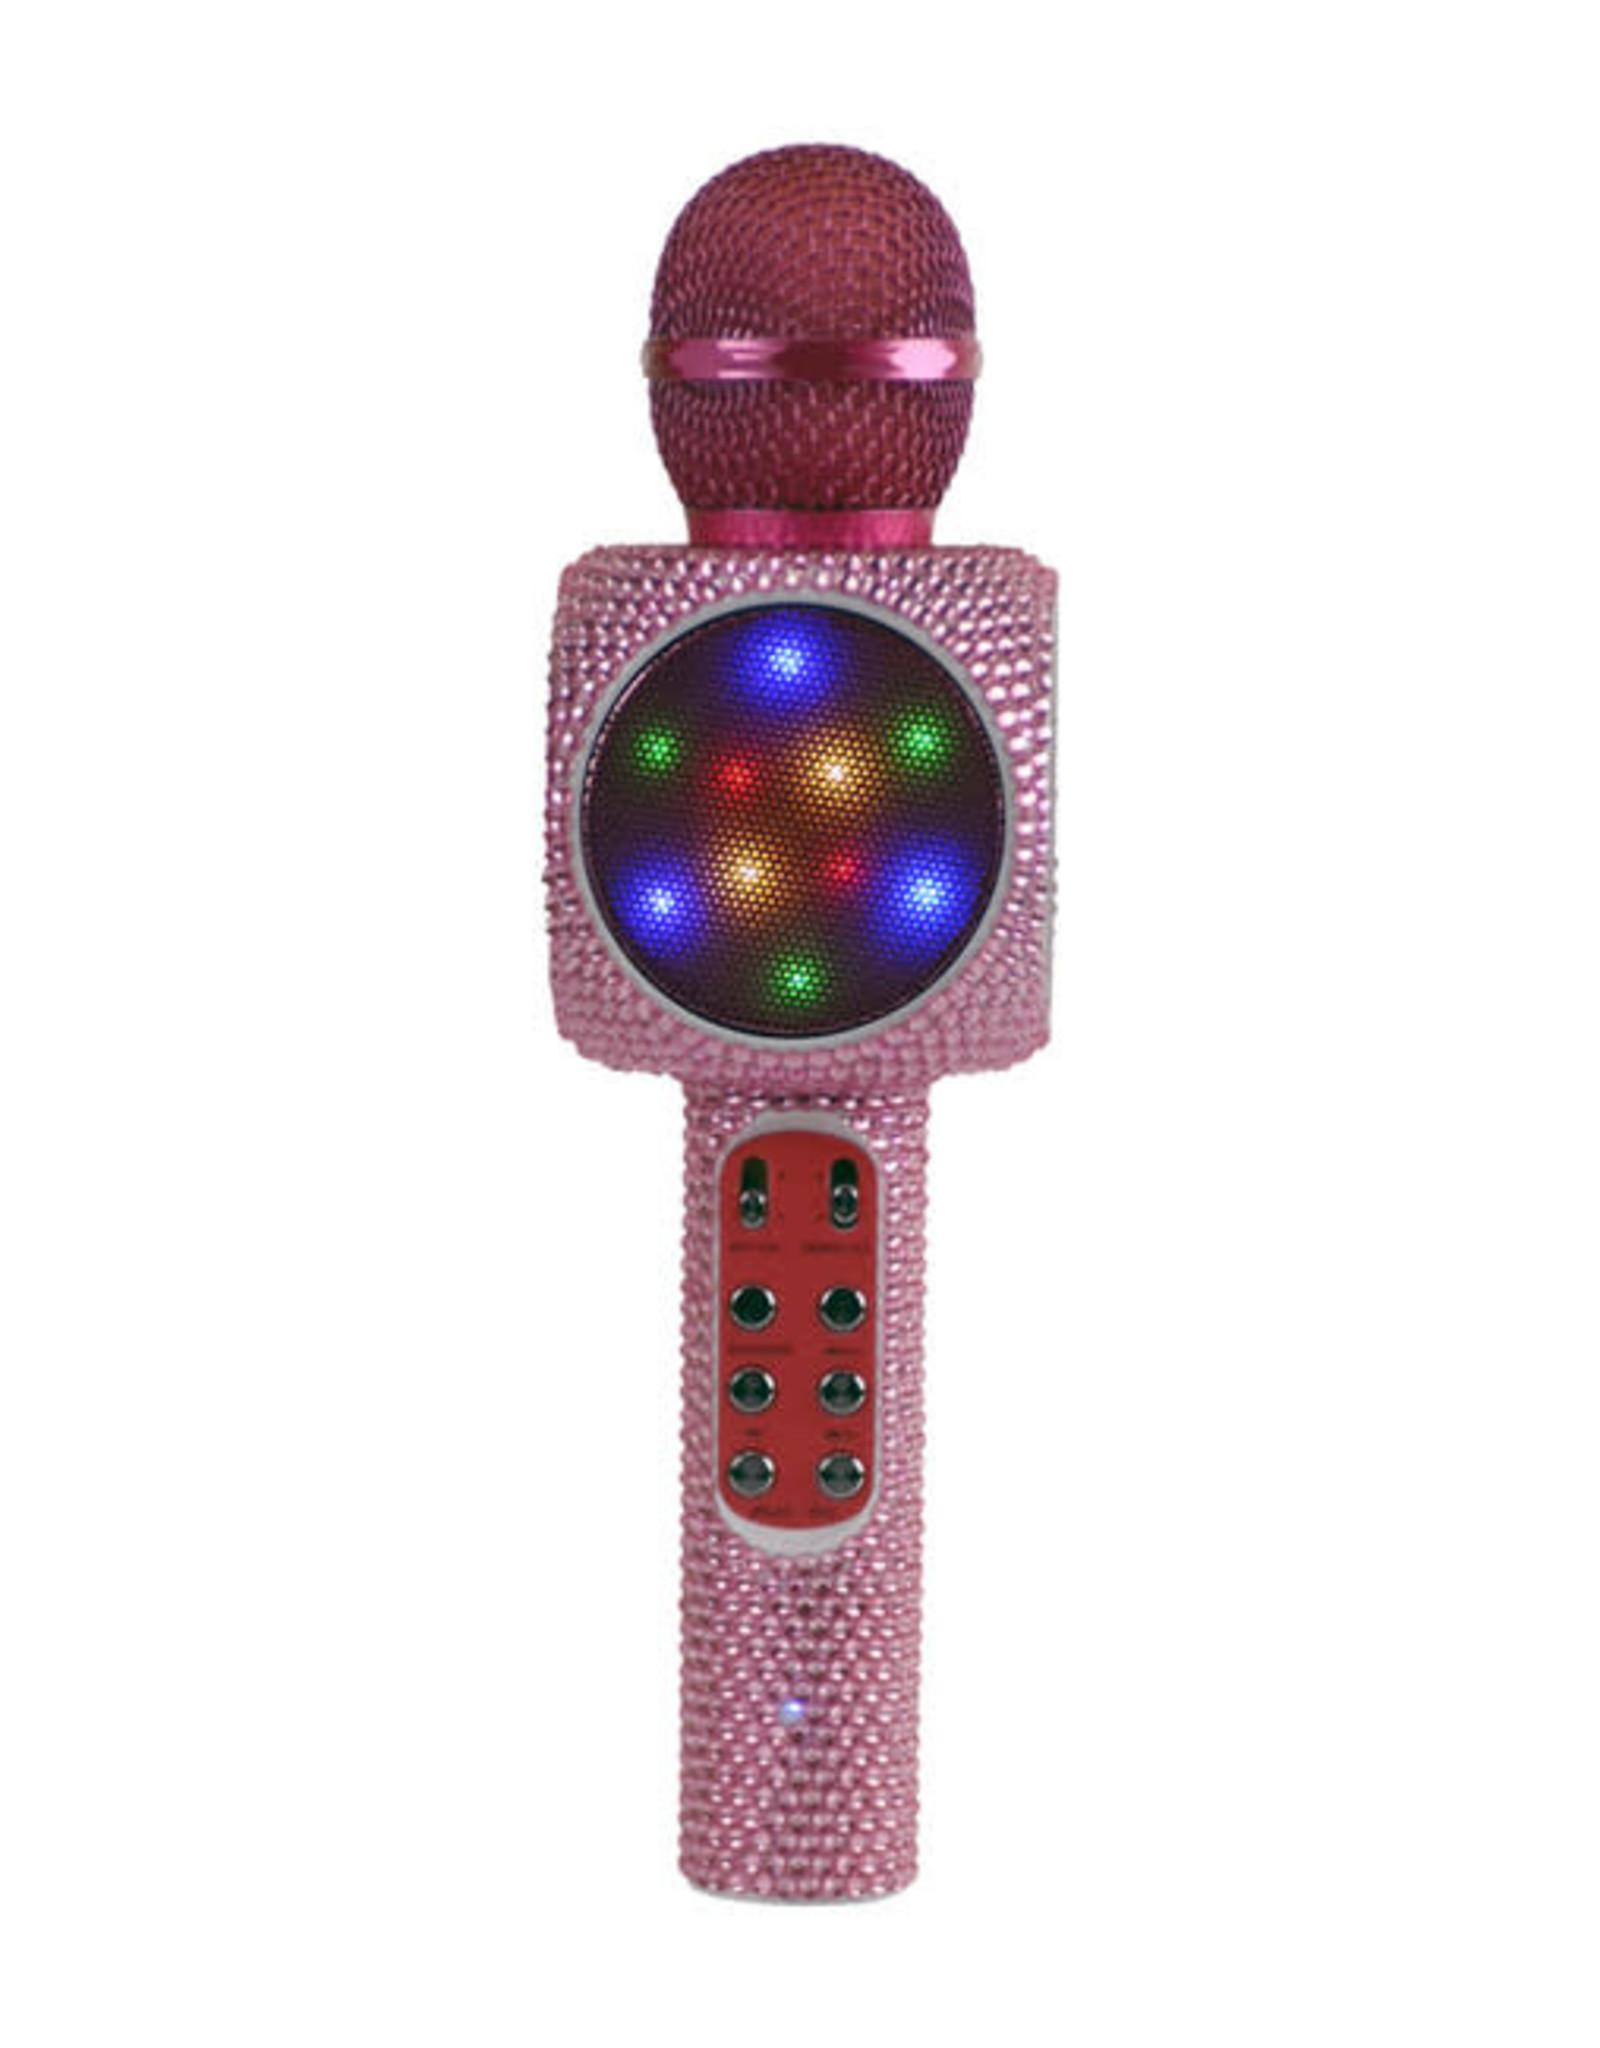 Wireless Express Bling Karakoke Microphone